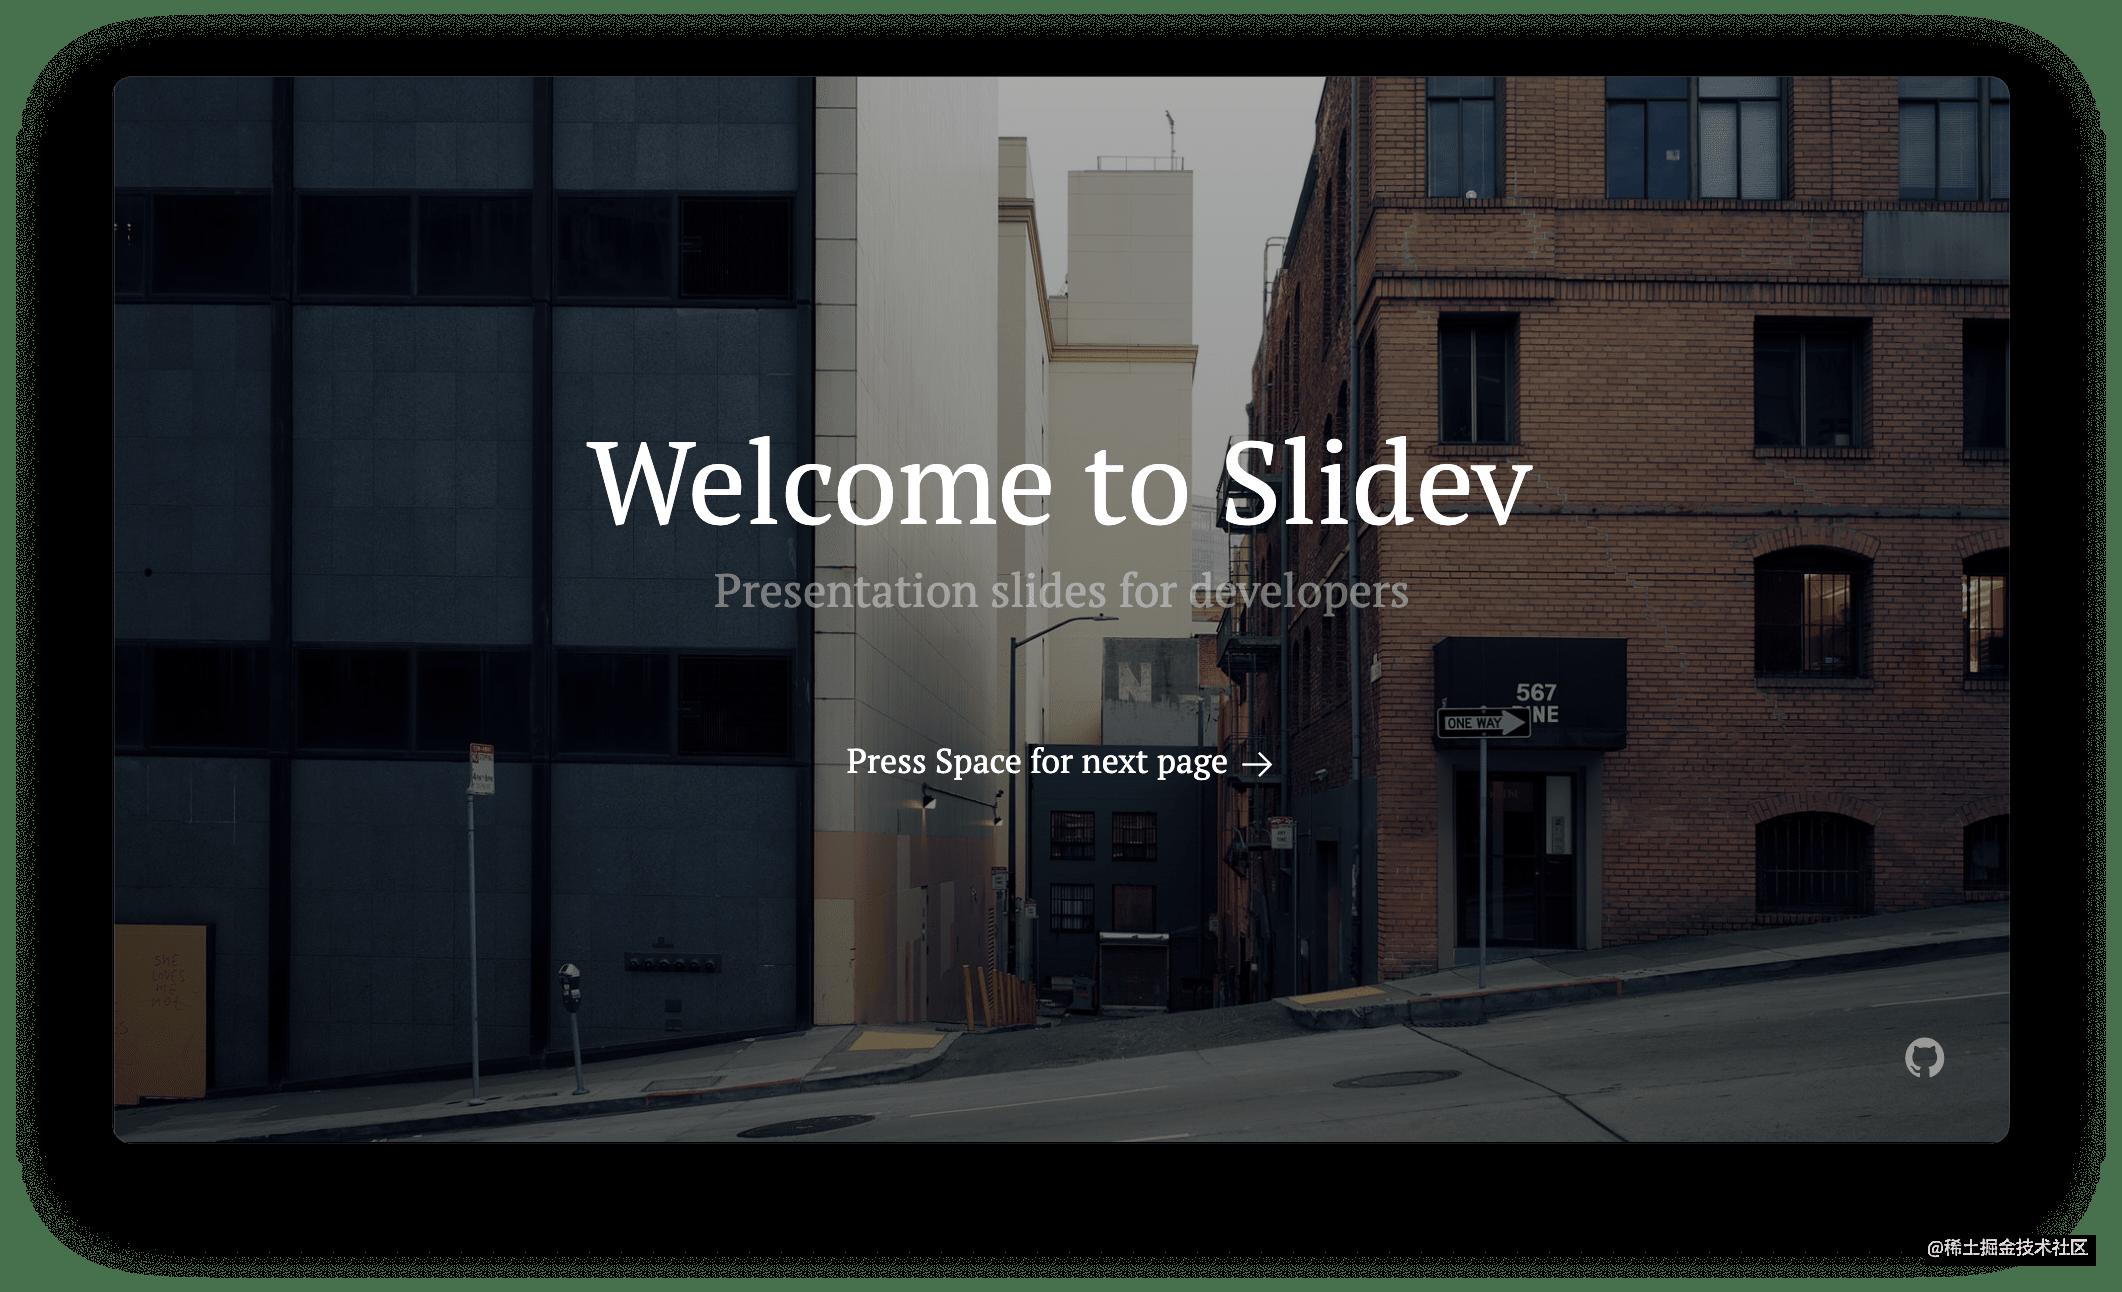 202105_slidev